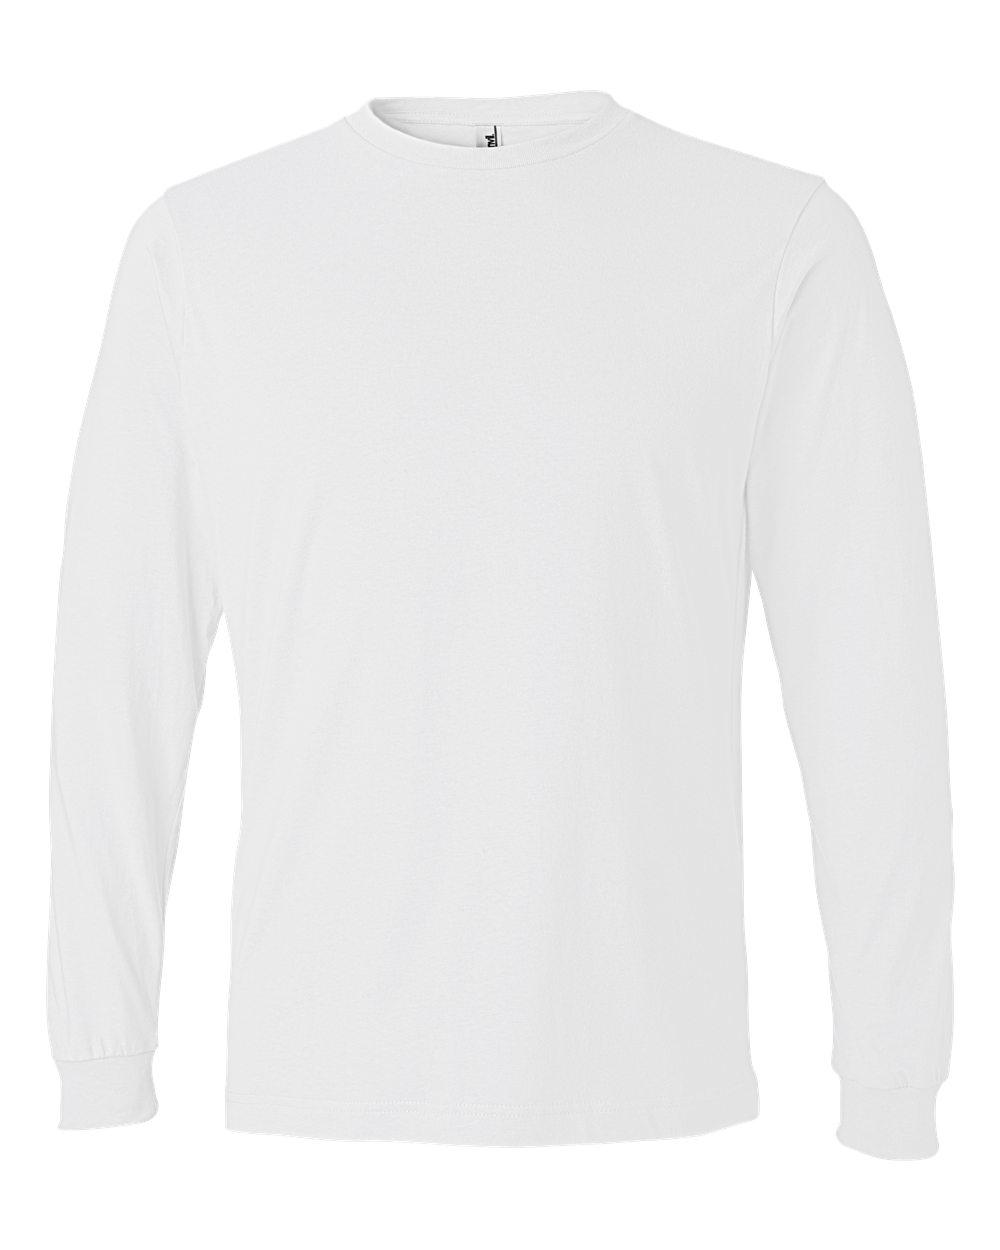 Image of Wyandot Run Mascot Long Sleeve Unisex Tee